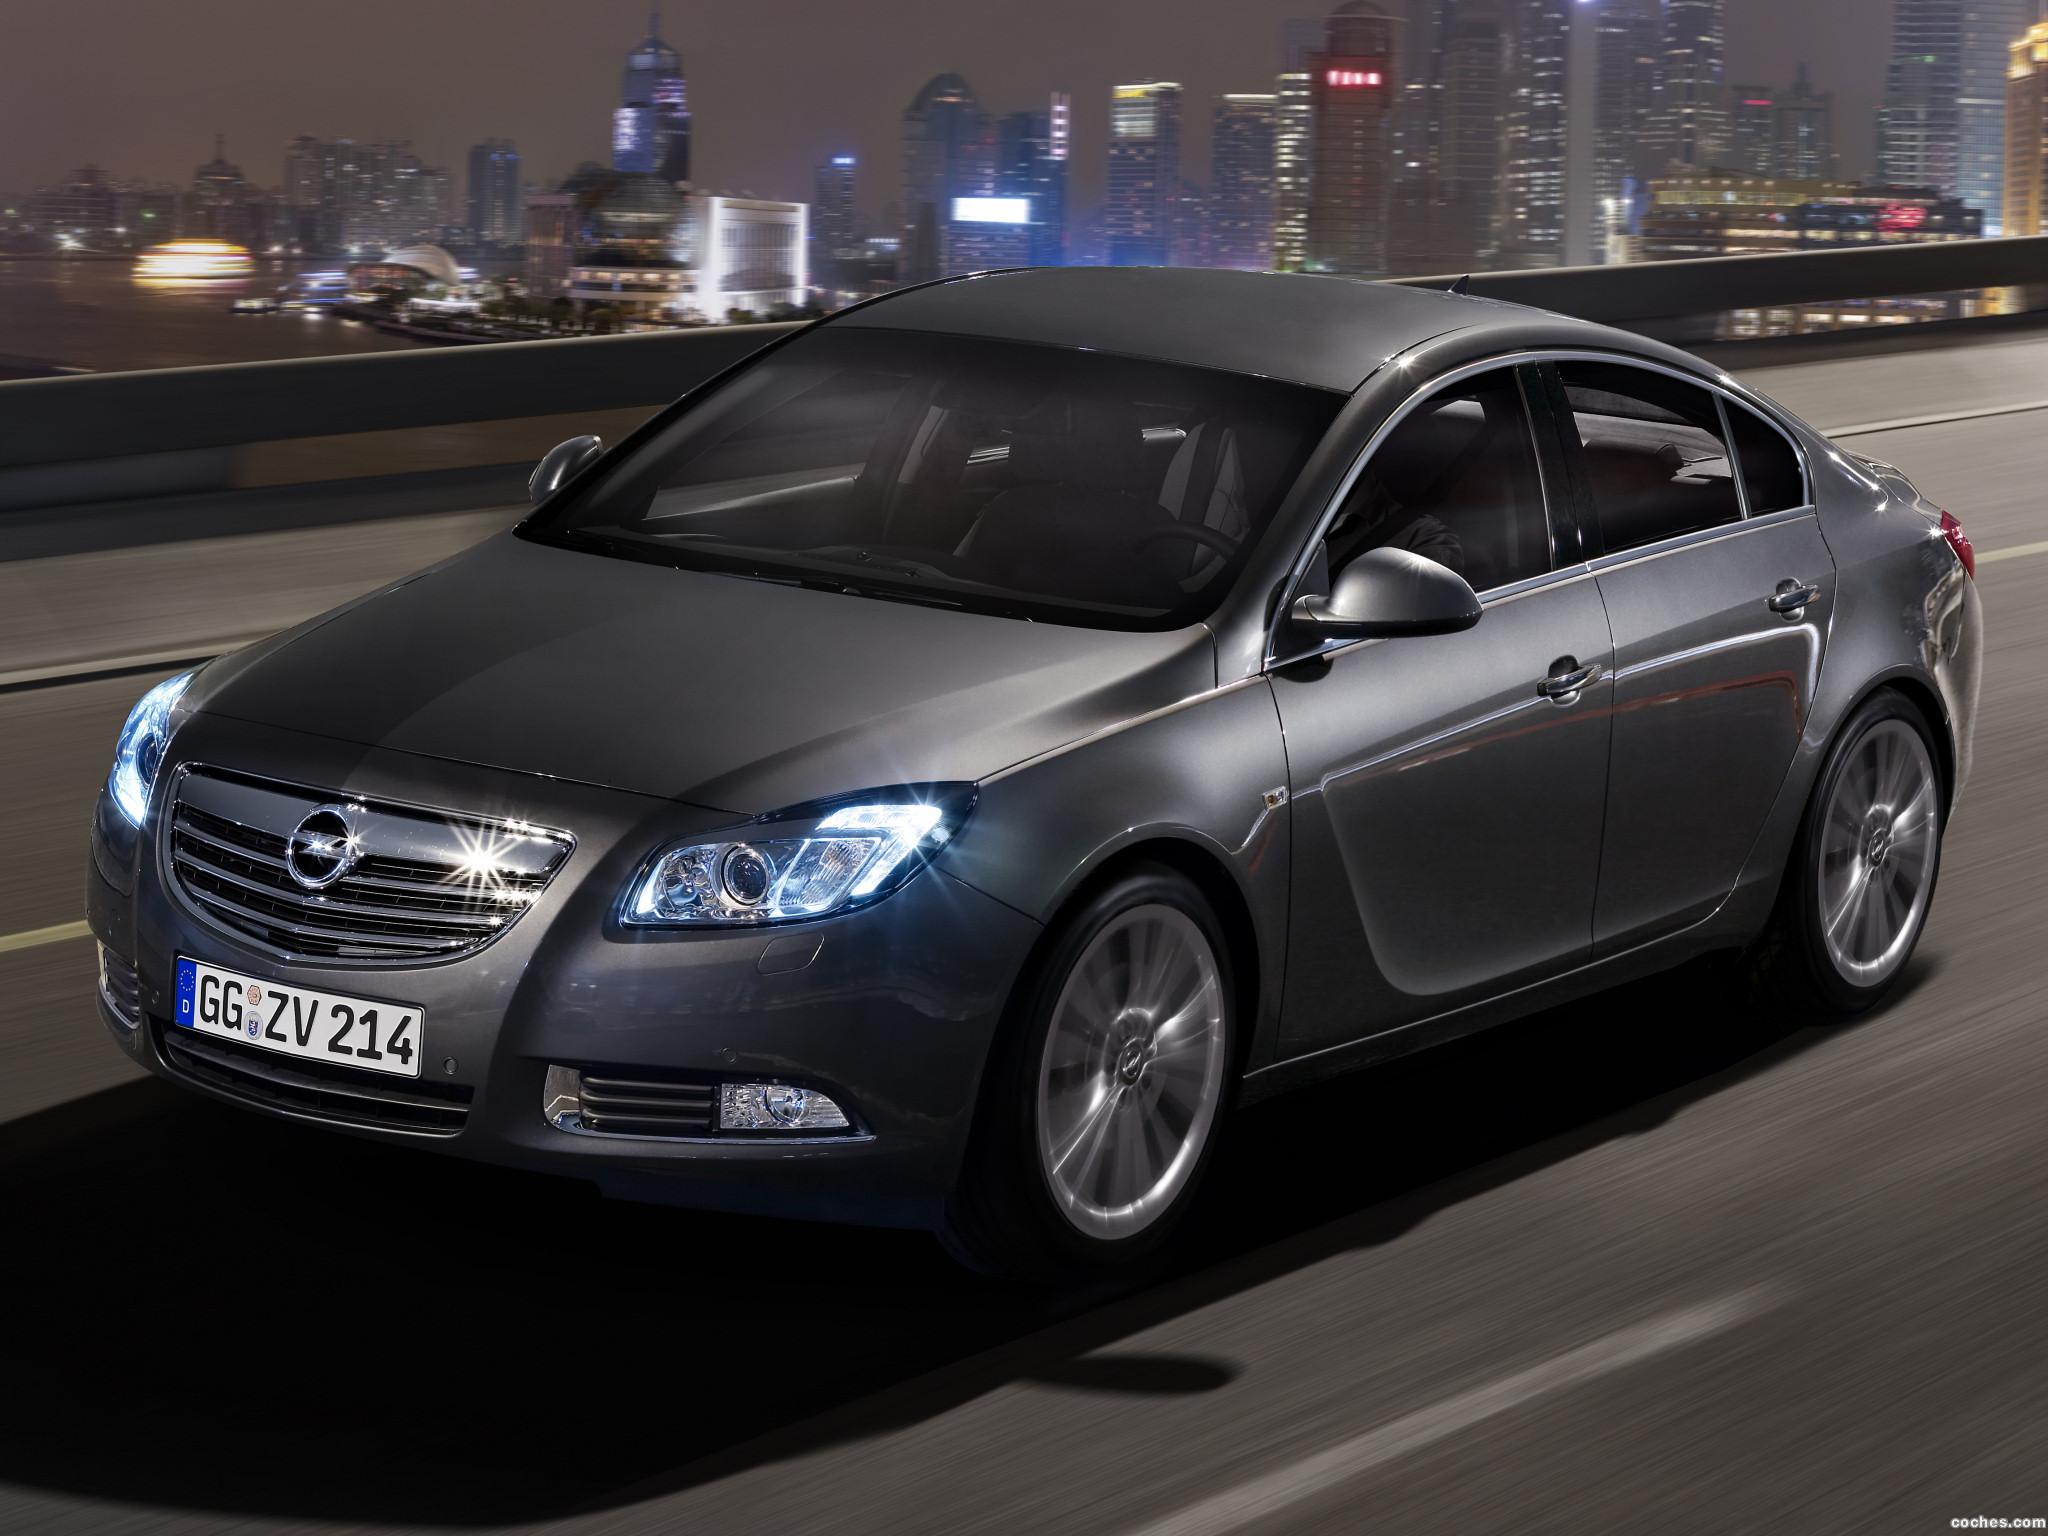 Foto 0 de Opel Insignia Hatchback 2008